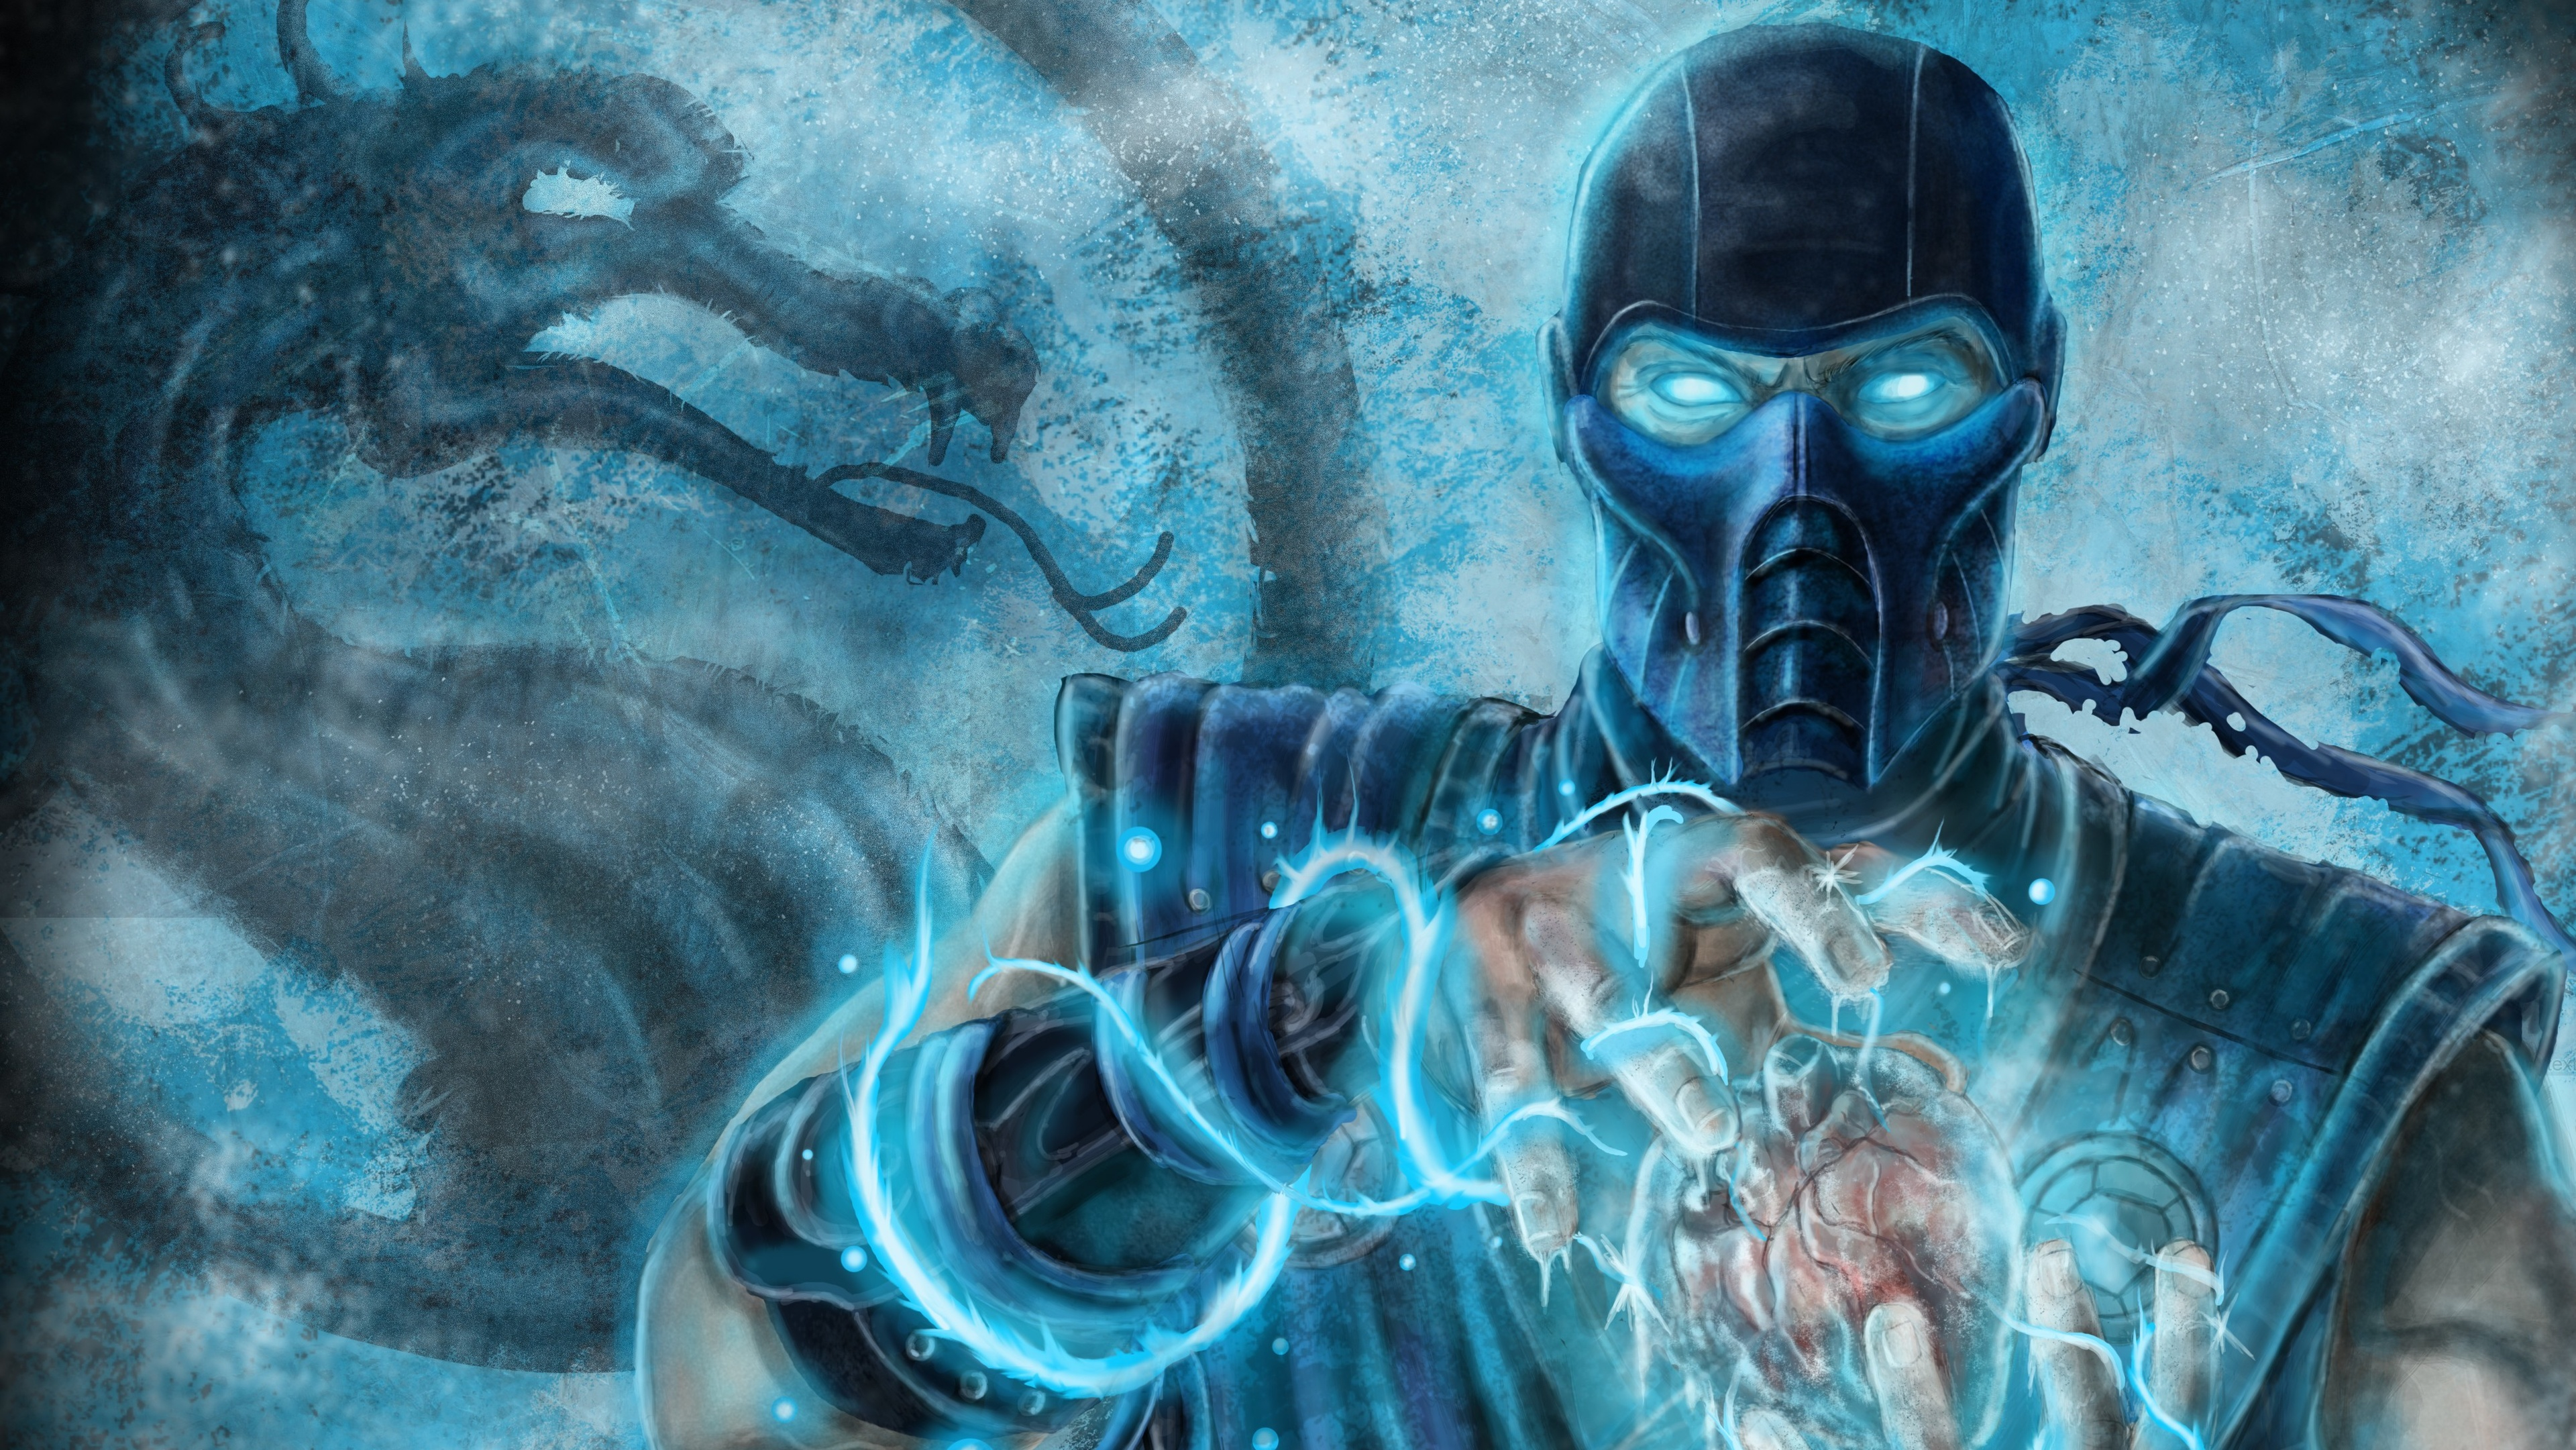 Free Download Sub Zero Mortal Kombat 4k Ultra Hd Wallpaper 4k